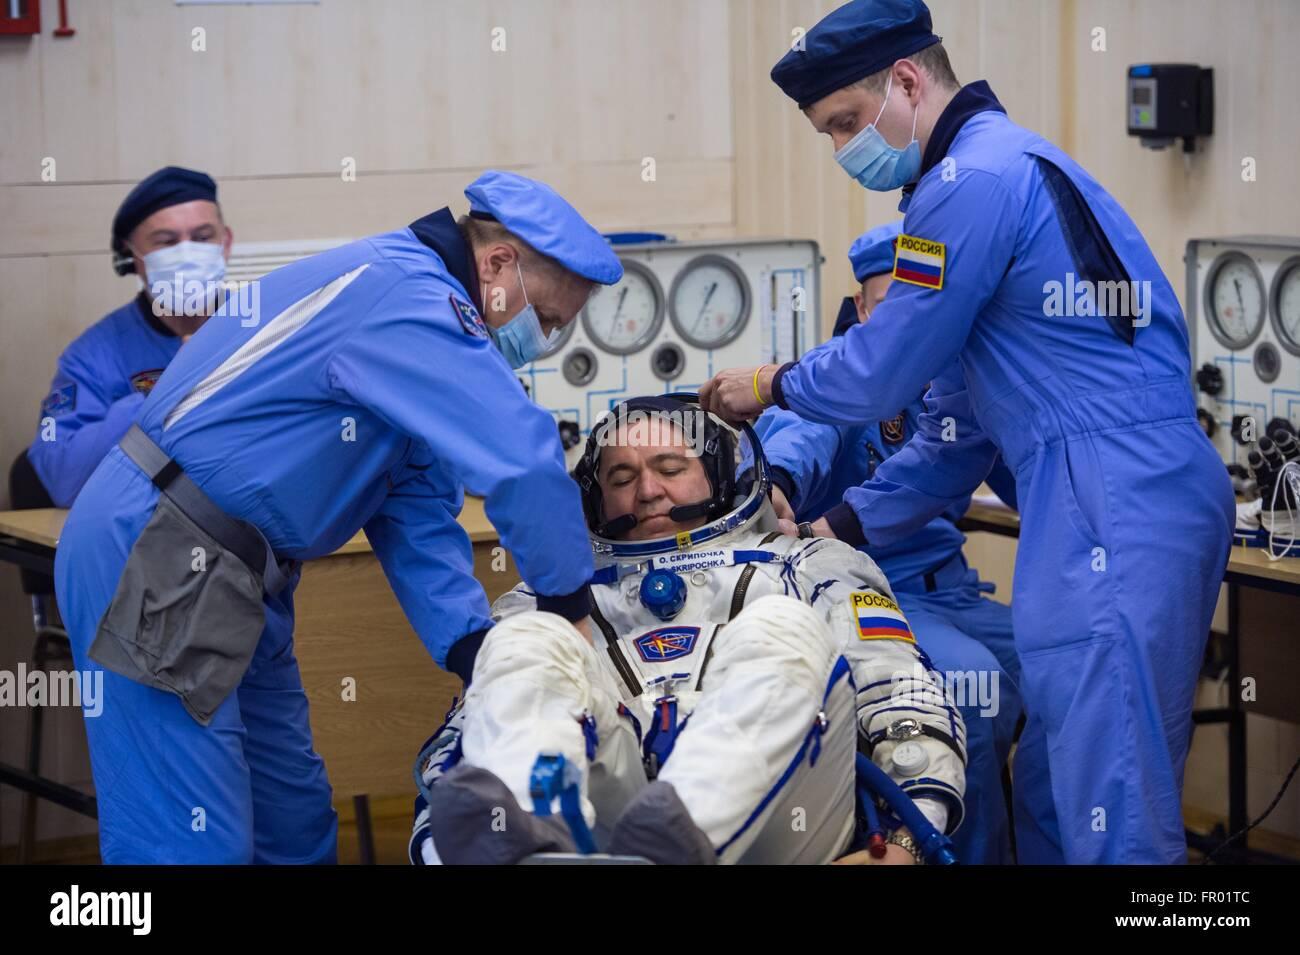 Baikonur, Kazakhstan. 19th Mar, 2016. Russian cosmonaut Oleg Skripochka during final pressure checks on his Russian - Stock Image